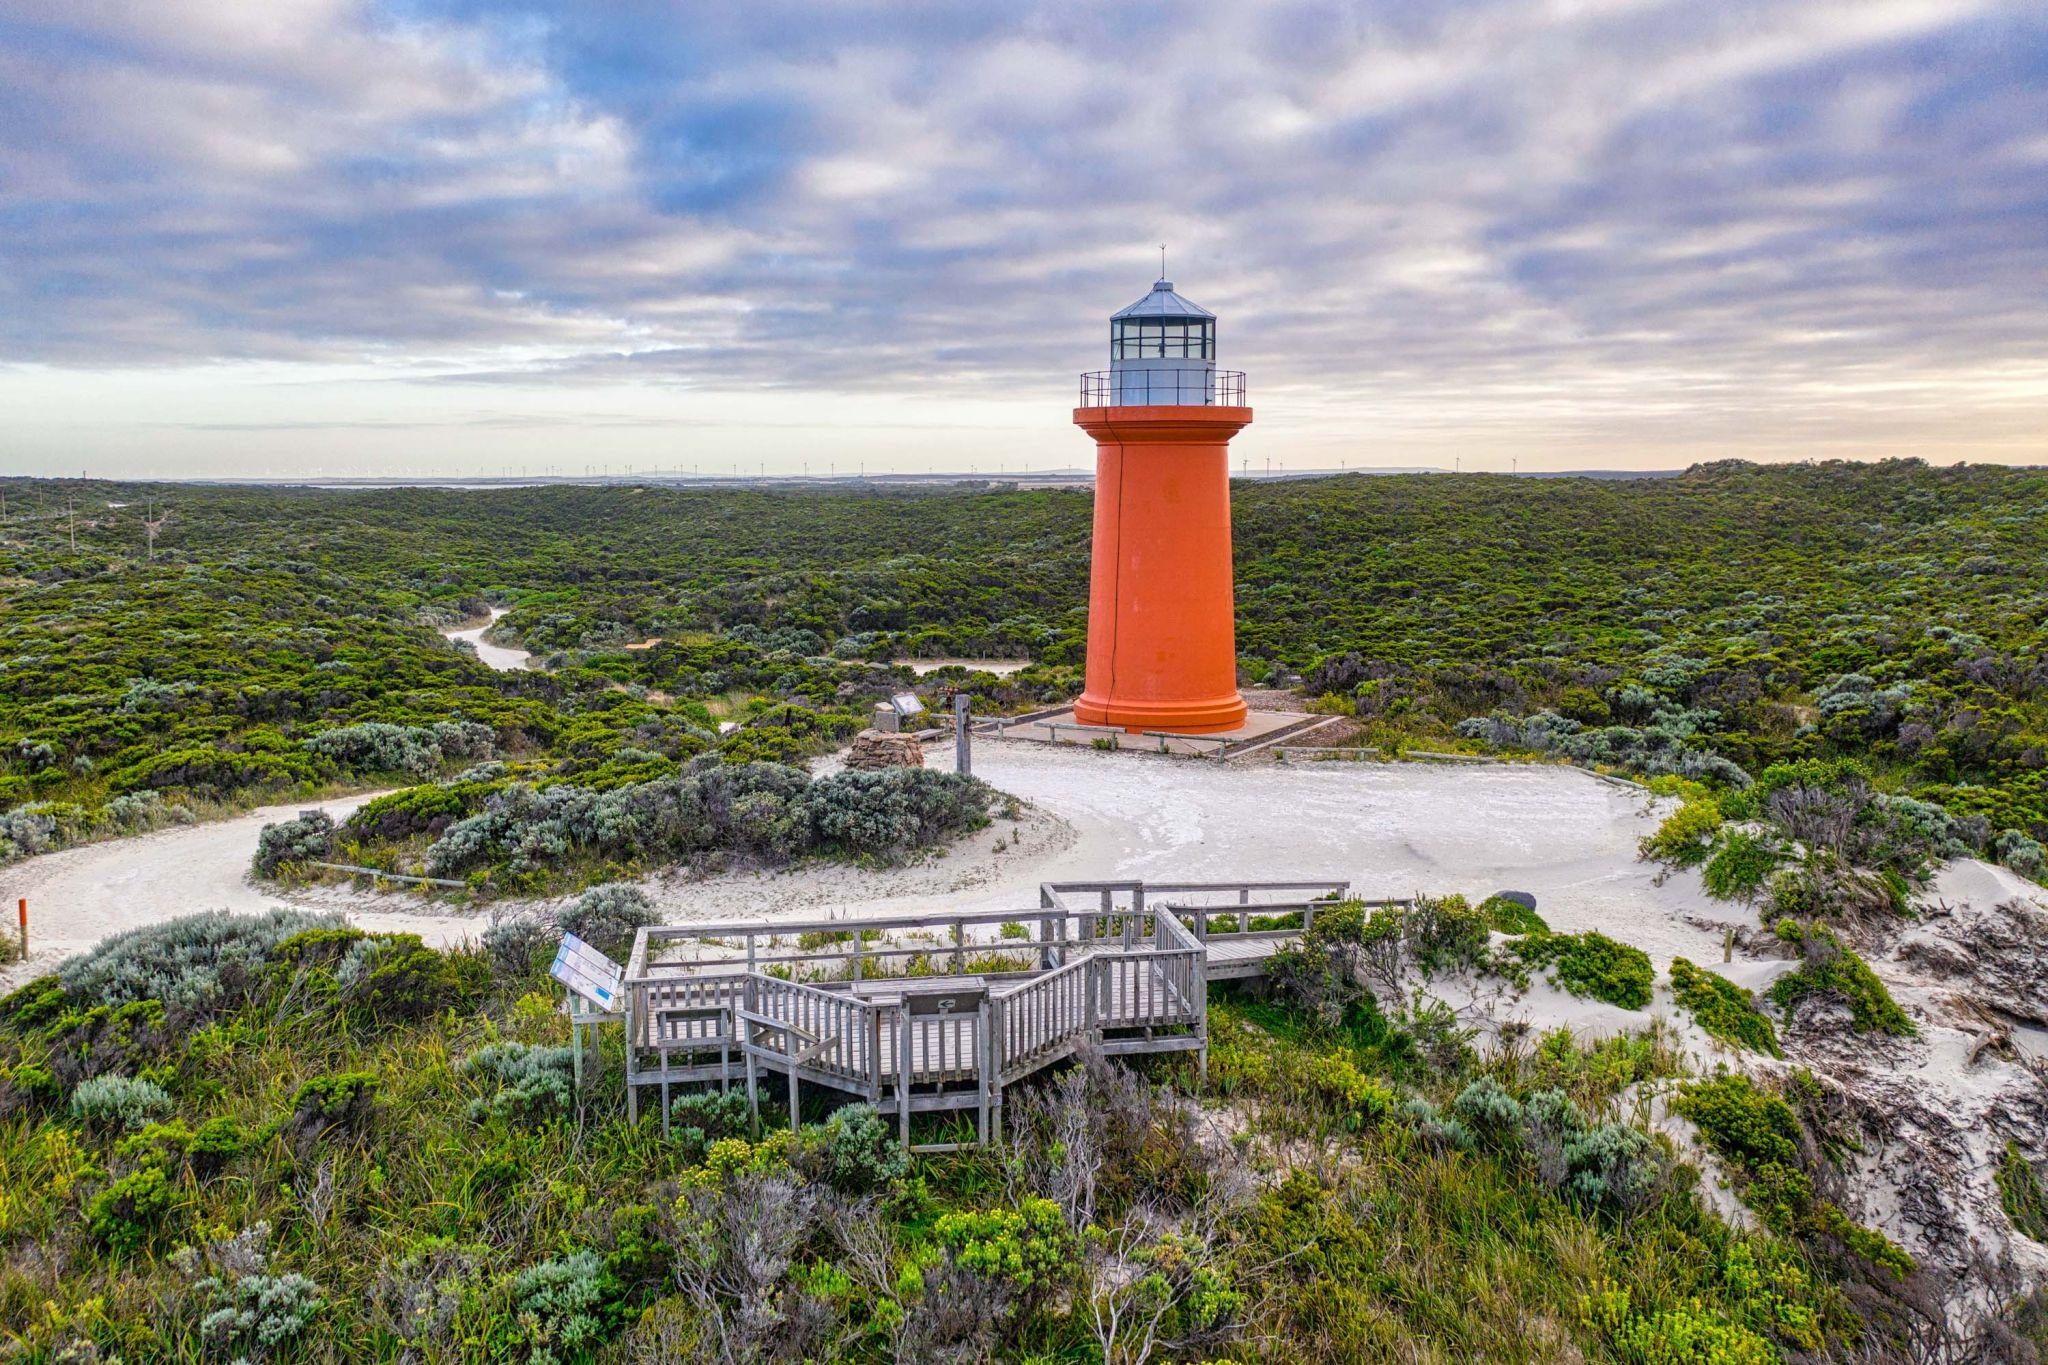 Cape Banks Lighthouse drone,South Australia, Australia